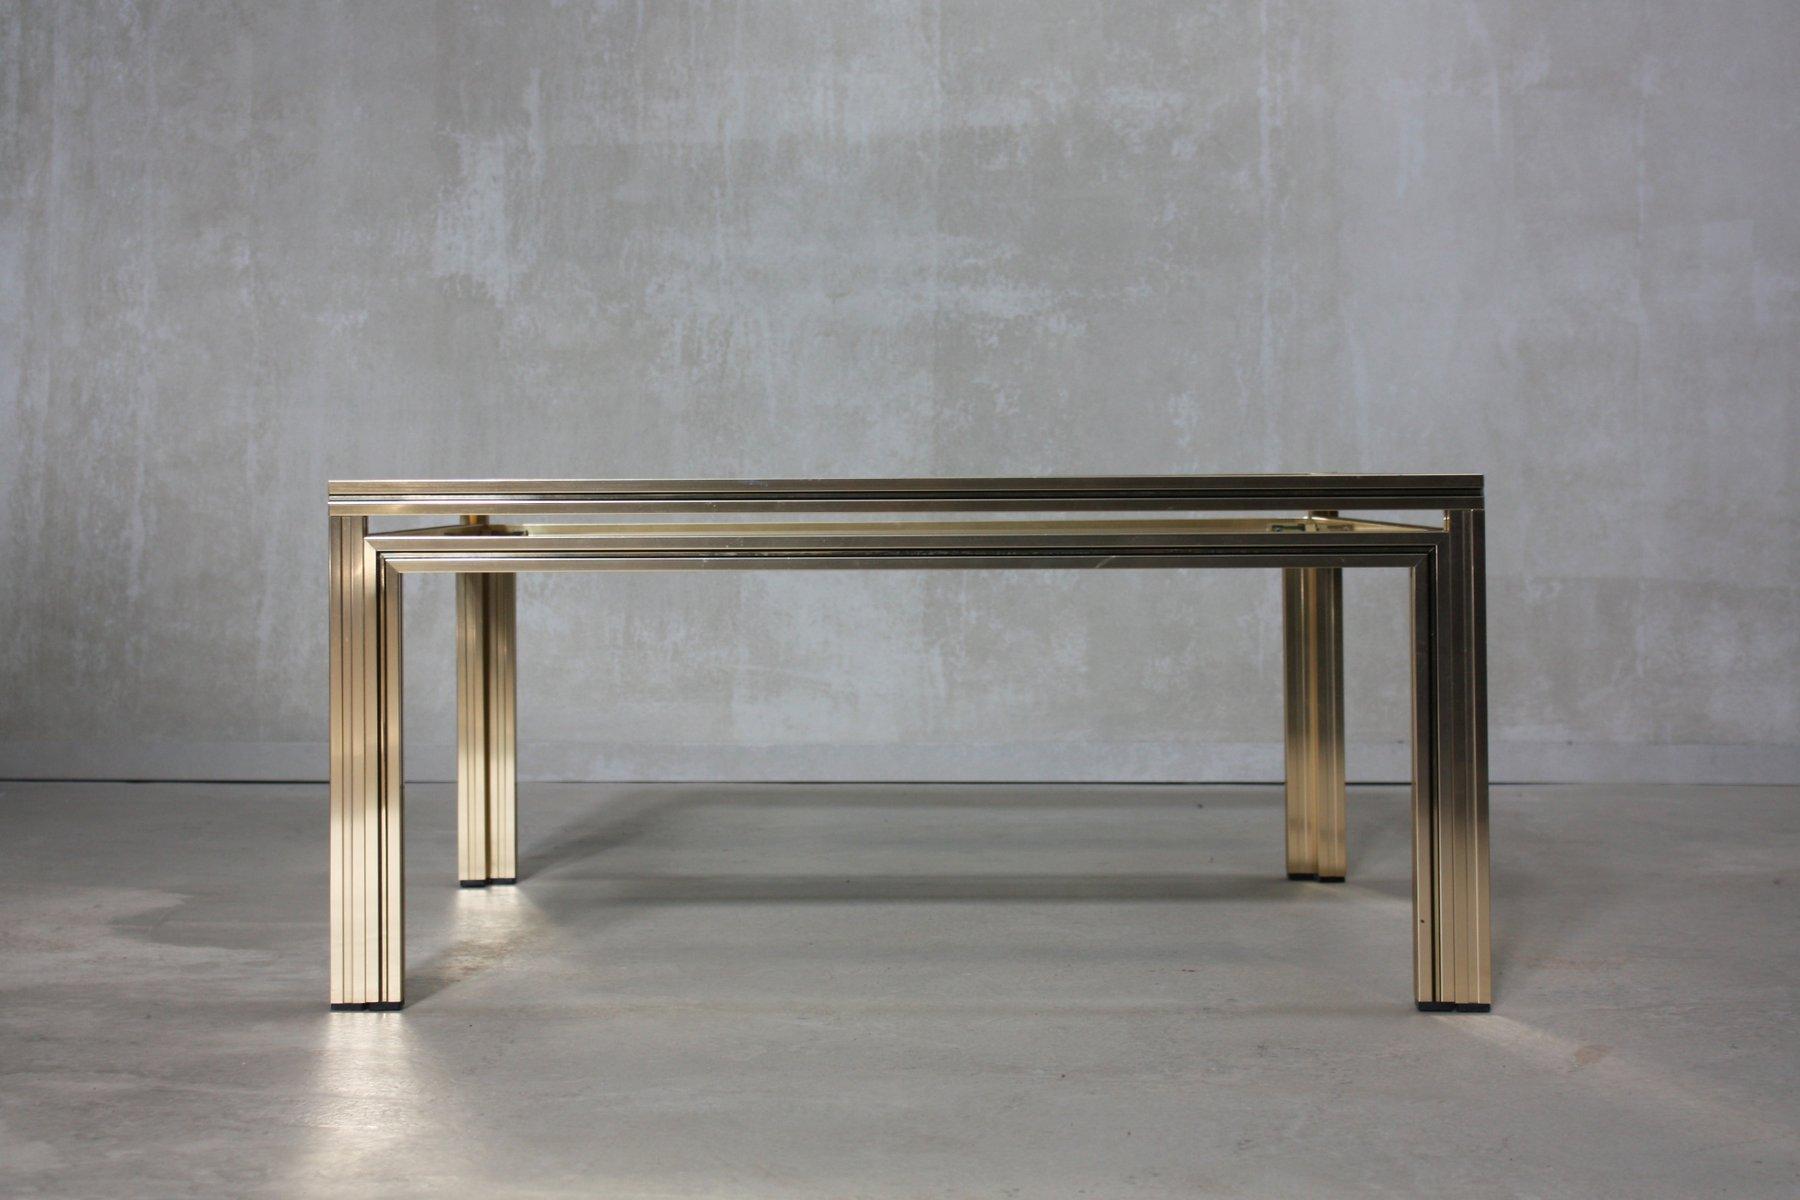 table basse dor e carr e par pierre vandel france 1970s en vente sur pamono. Black Bedroom Furniture Sets. Home Design Ideas